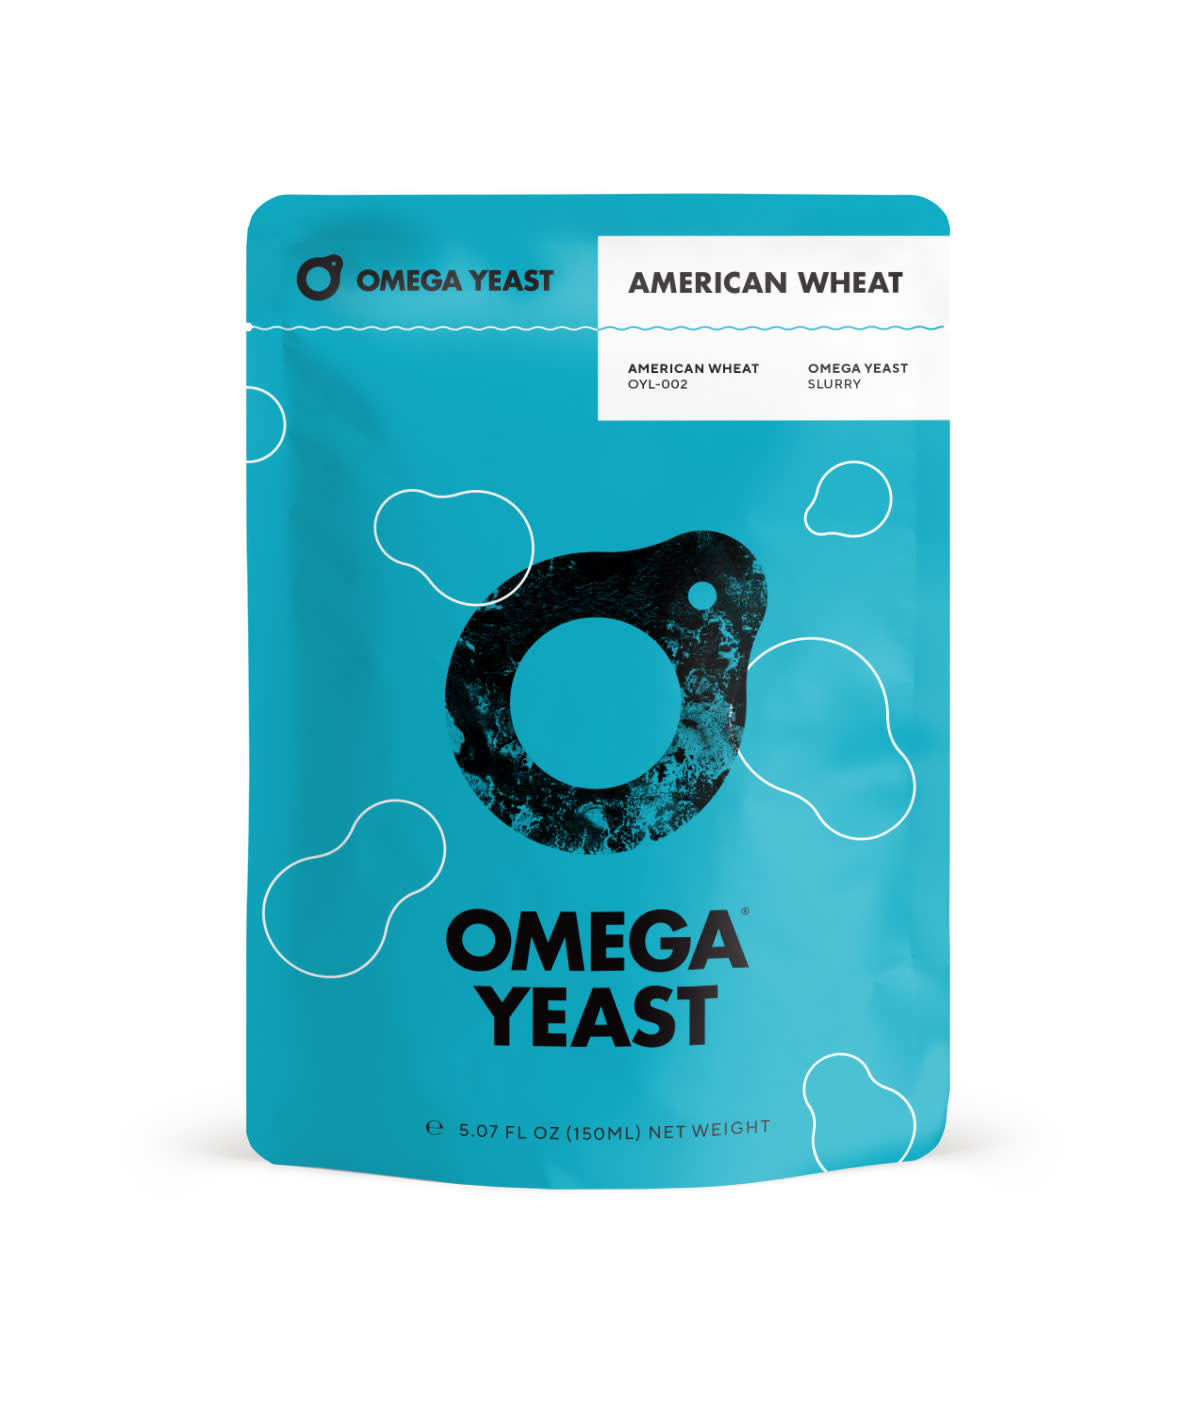 Omega Yeast Labs Omega American Wheat (OYL-002)